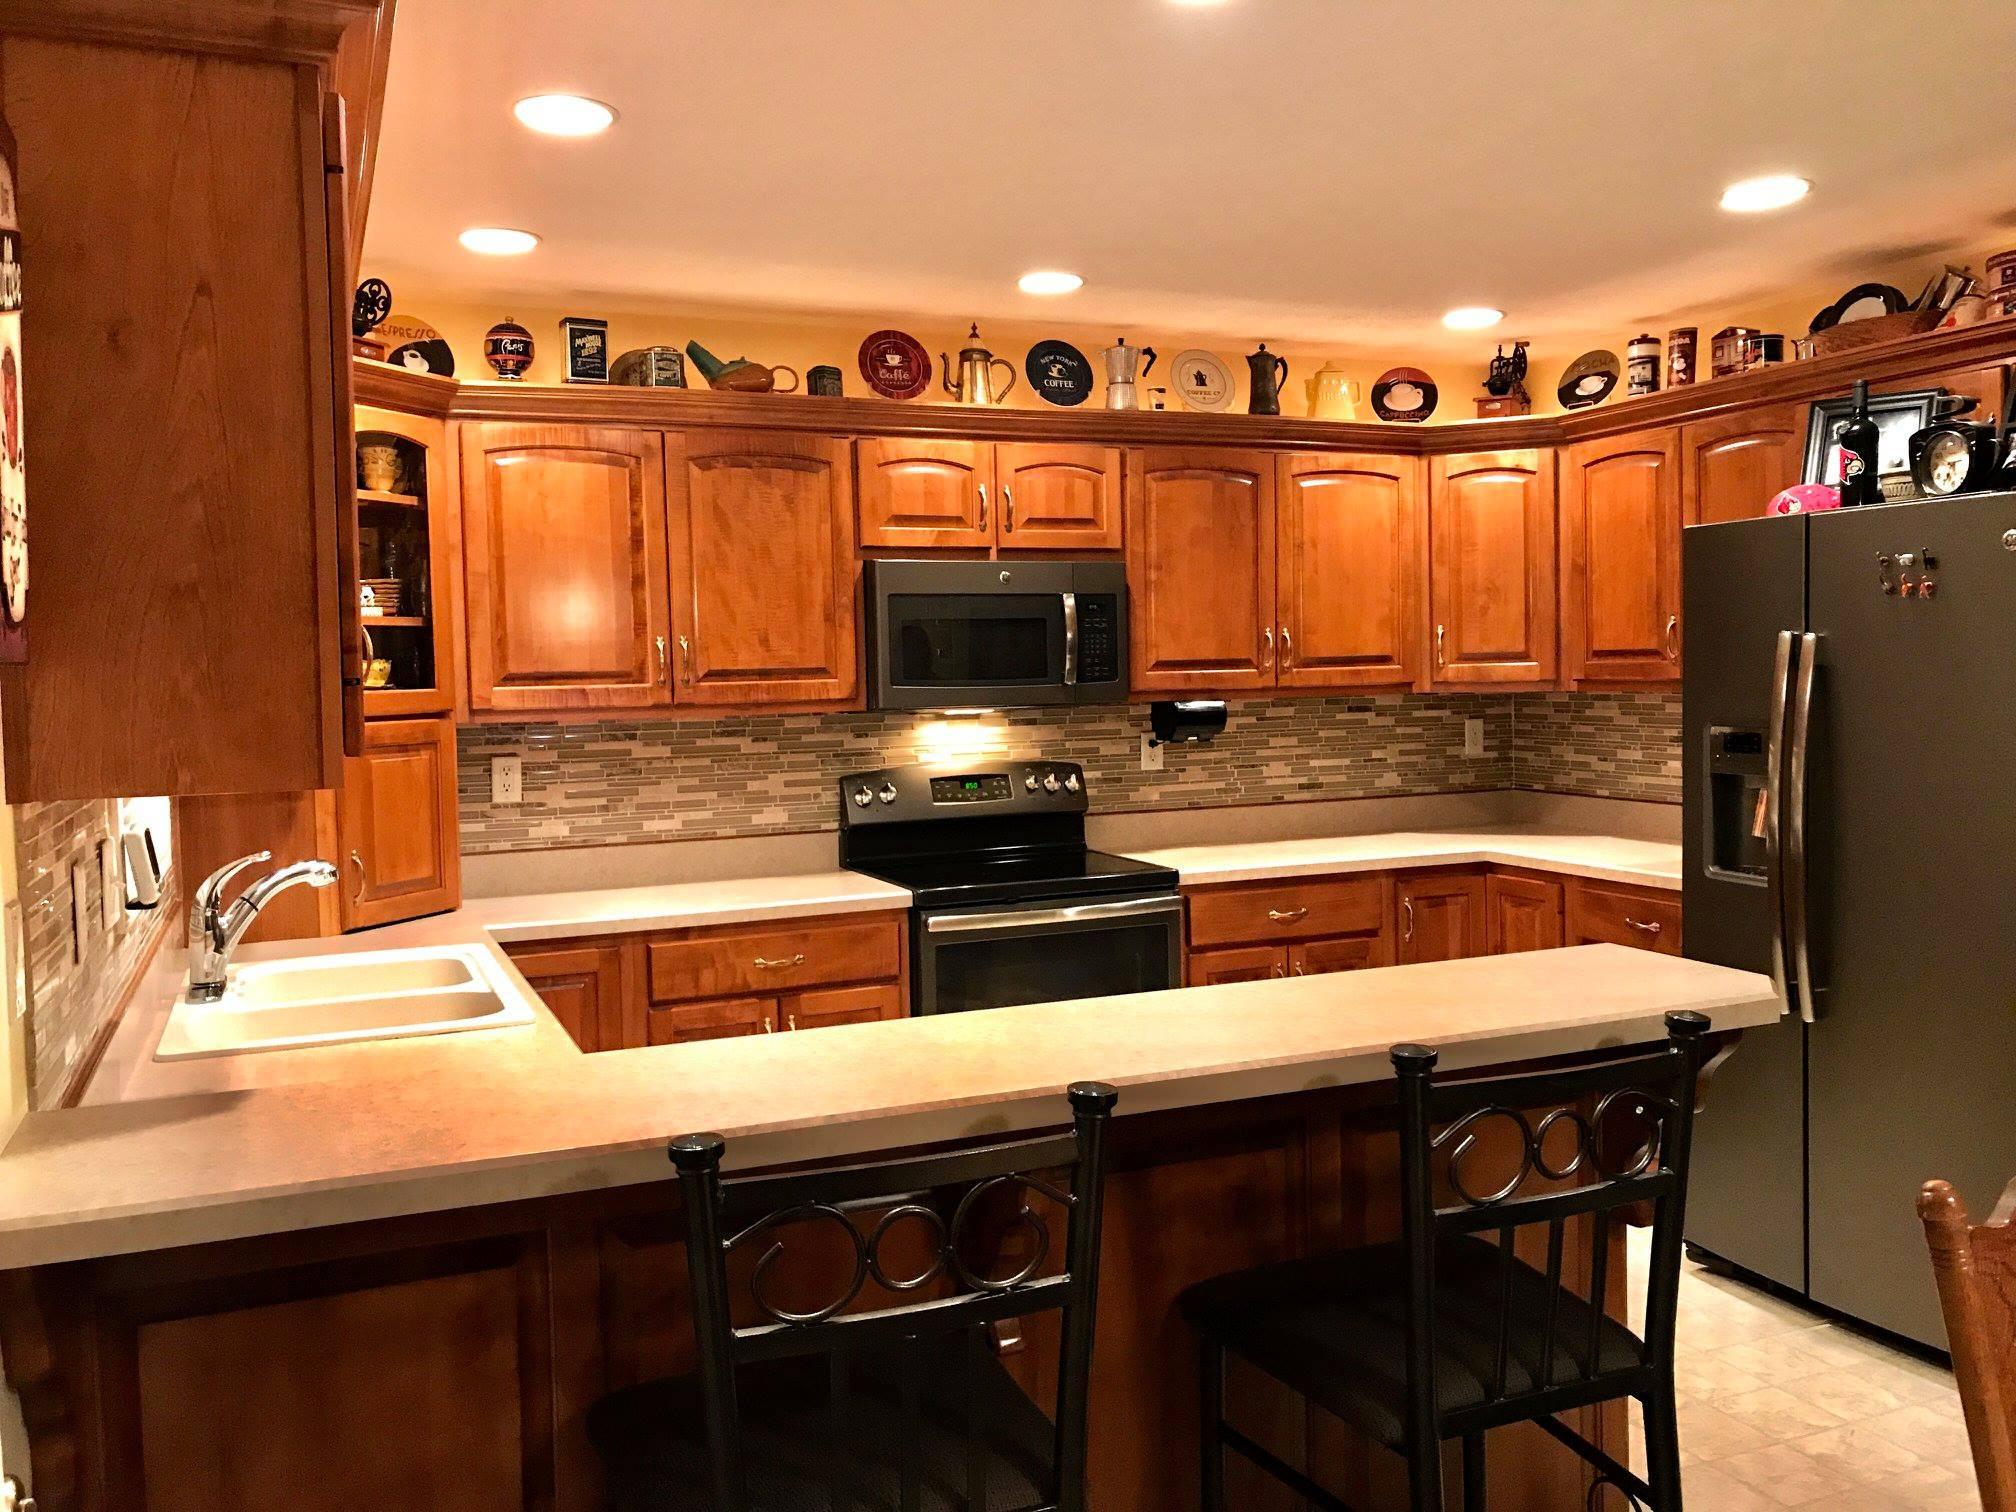 Blake Kitchen Remodel and Backsplash 3